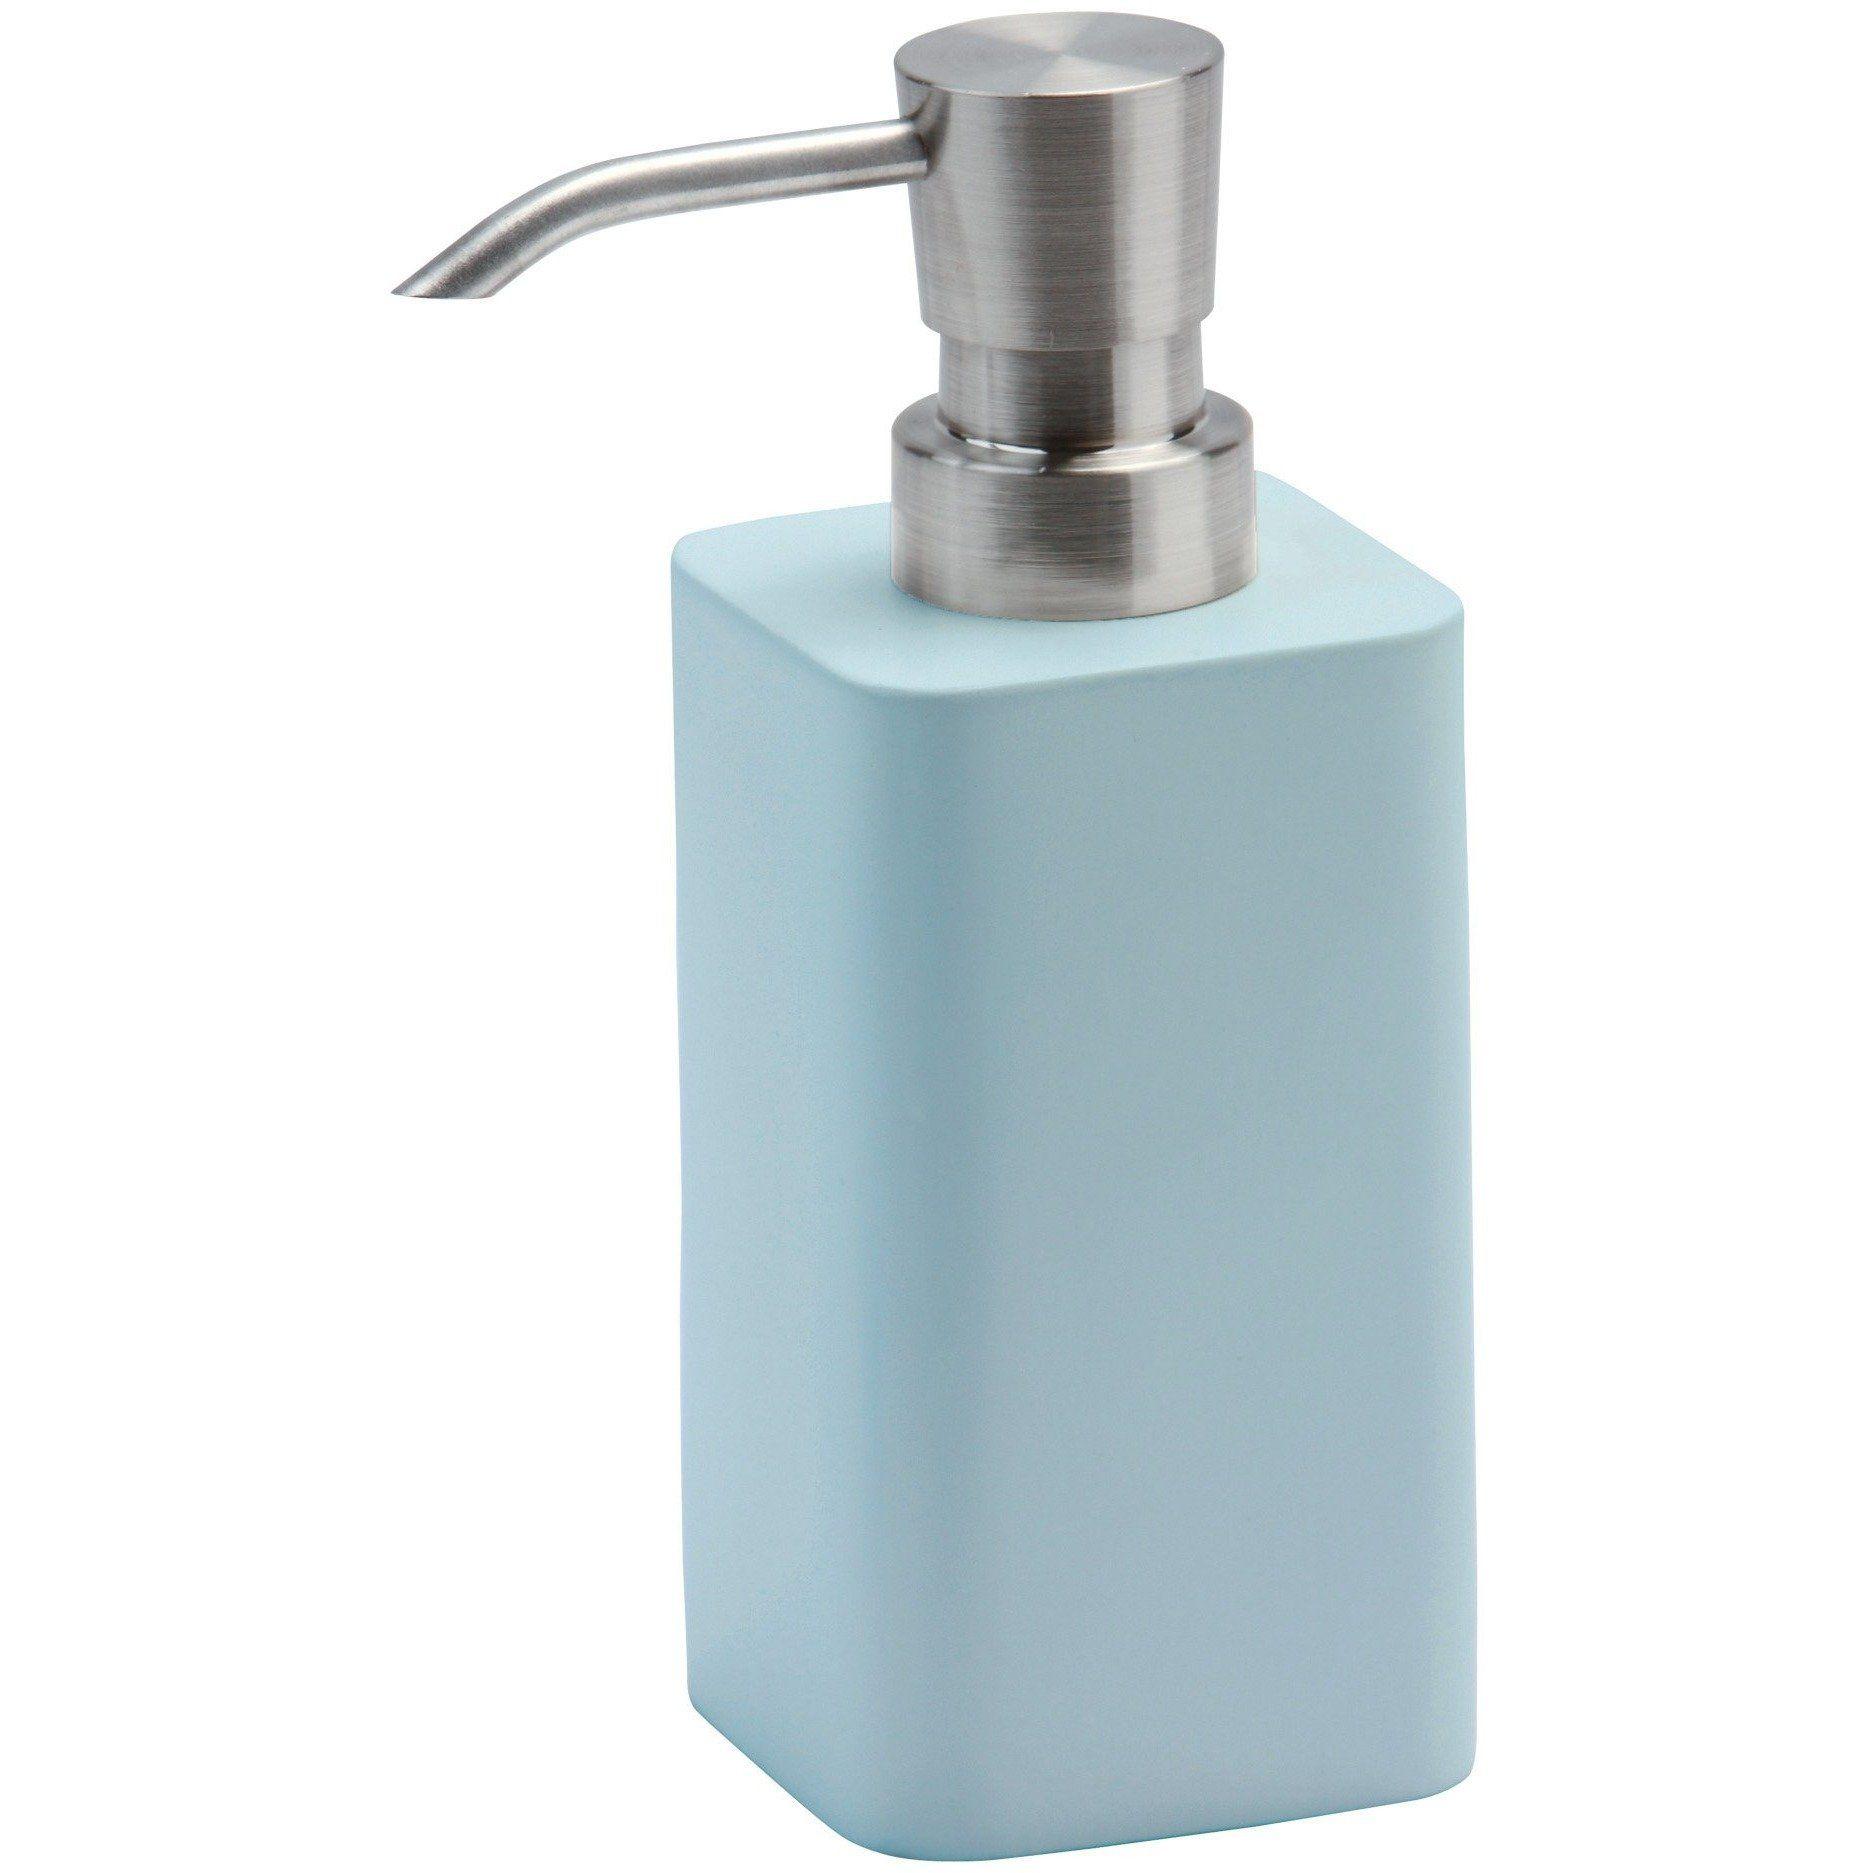 Ona Square Resin Bathroom Or Kitchen Pump Liquid Soap Lotion